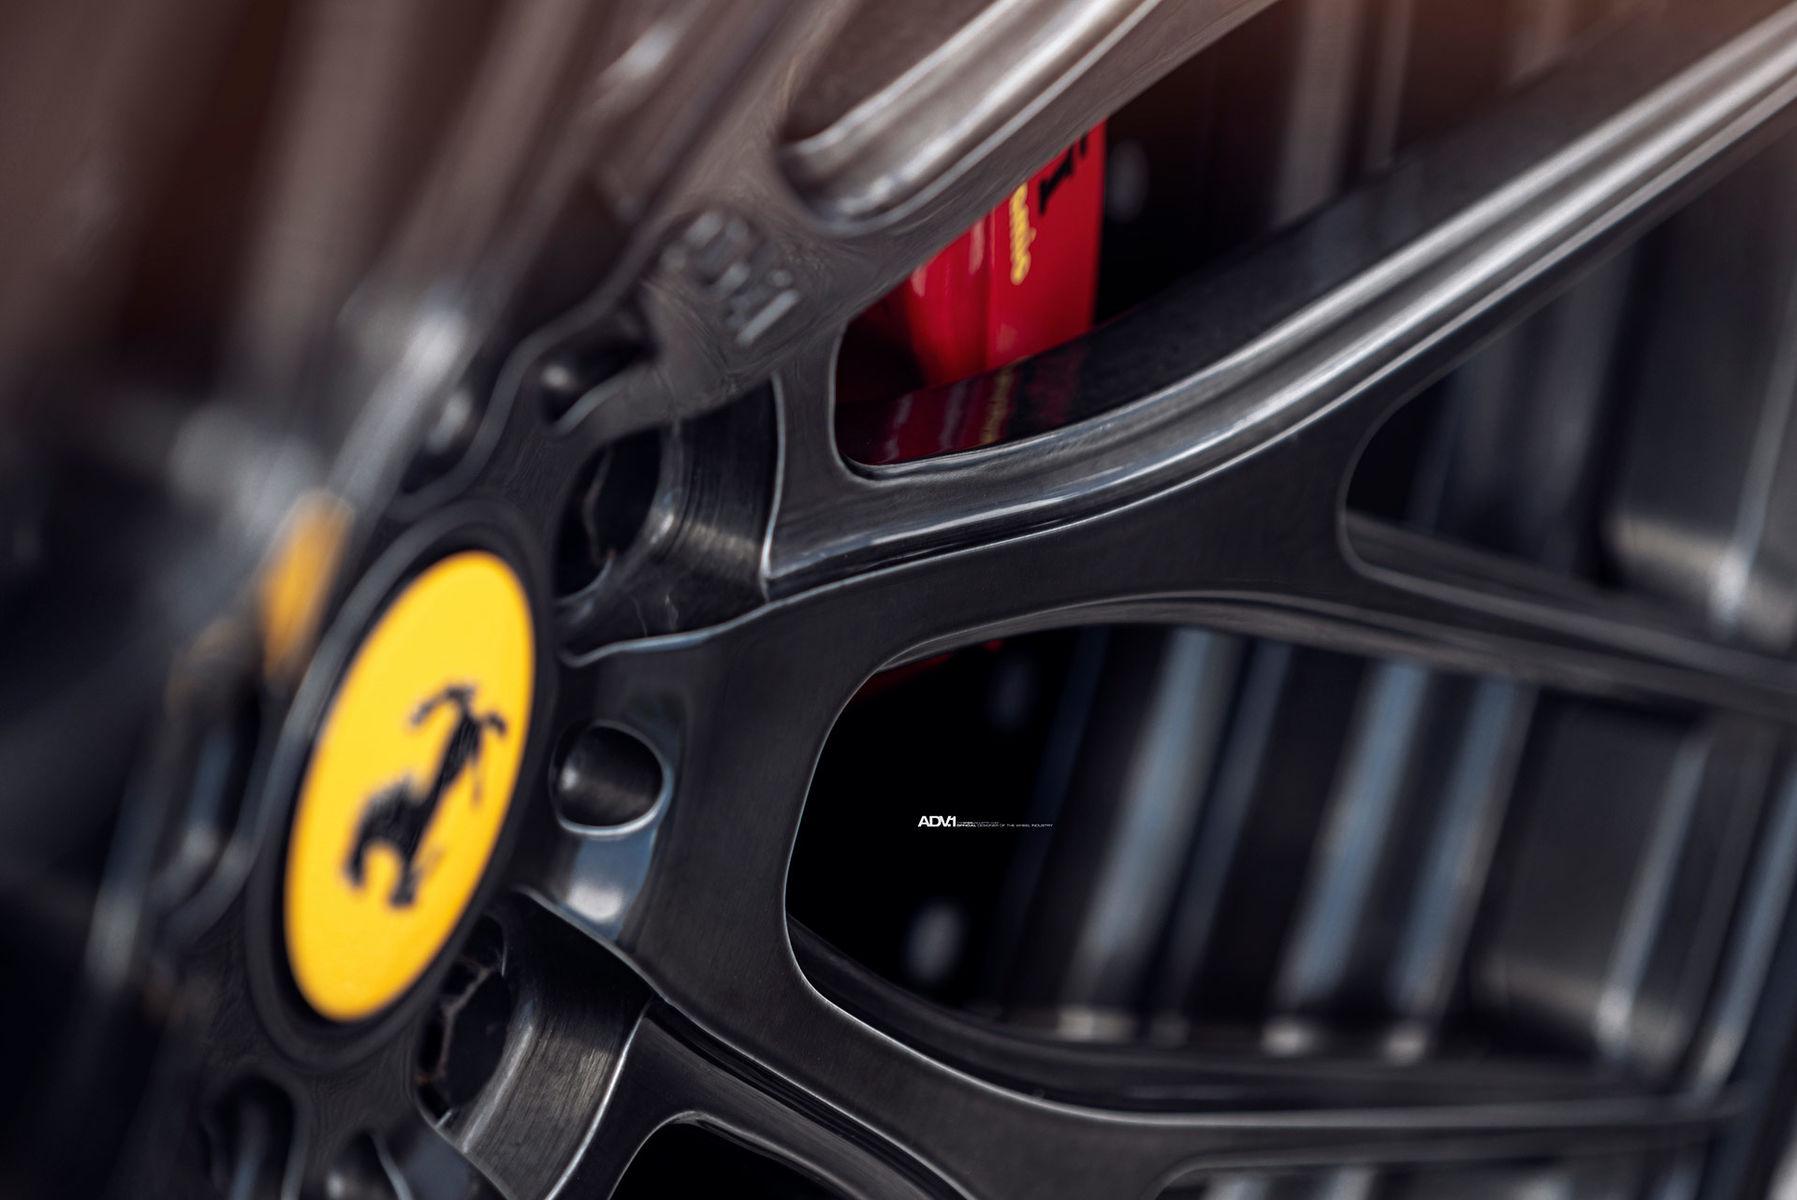 Ferrari F12 Berlinetta | Ferrari F12 Berlinetta - ADV.1 ADV10.0 M.V2 SL Series Wheels